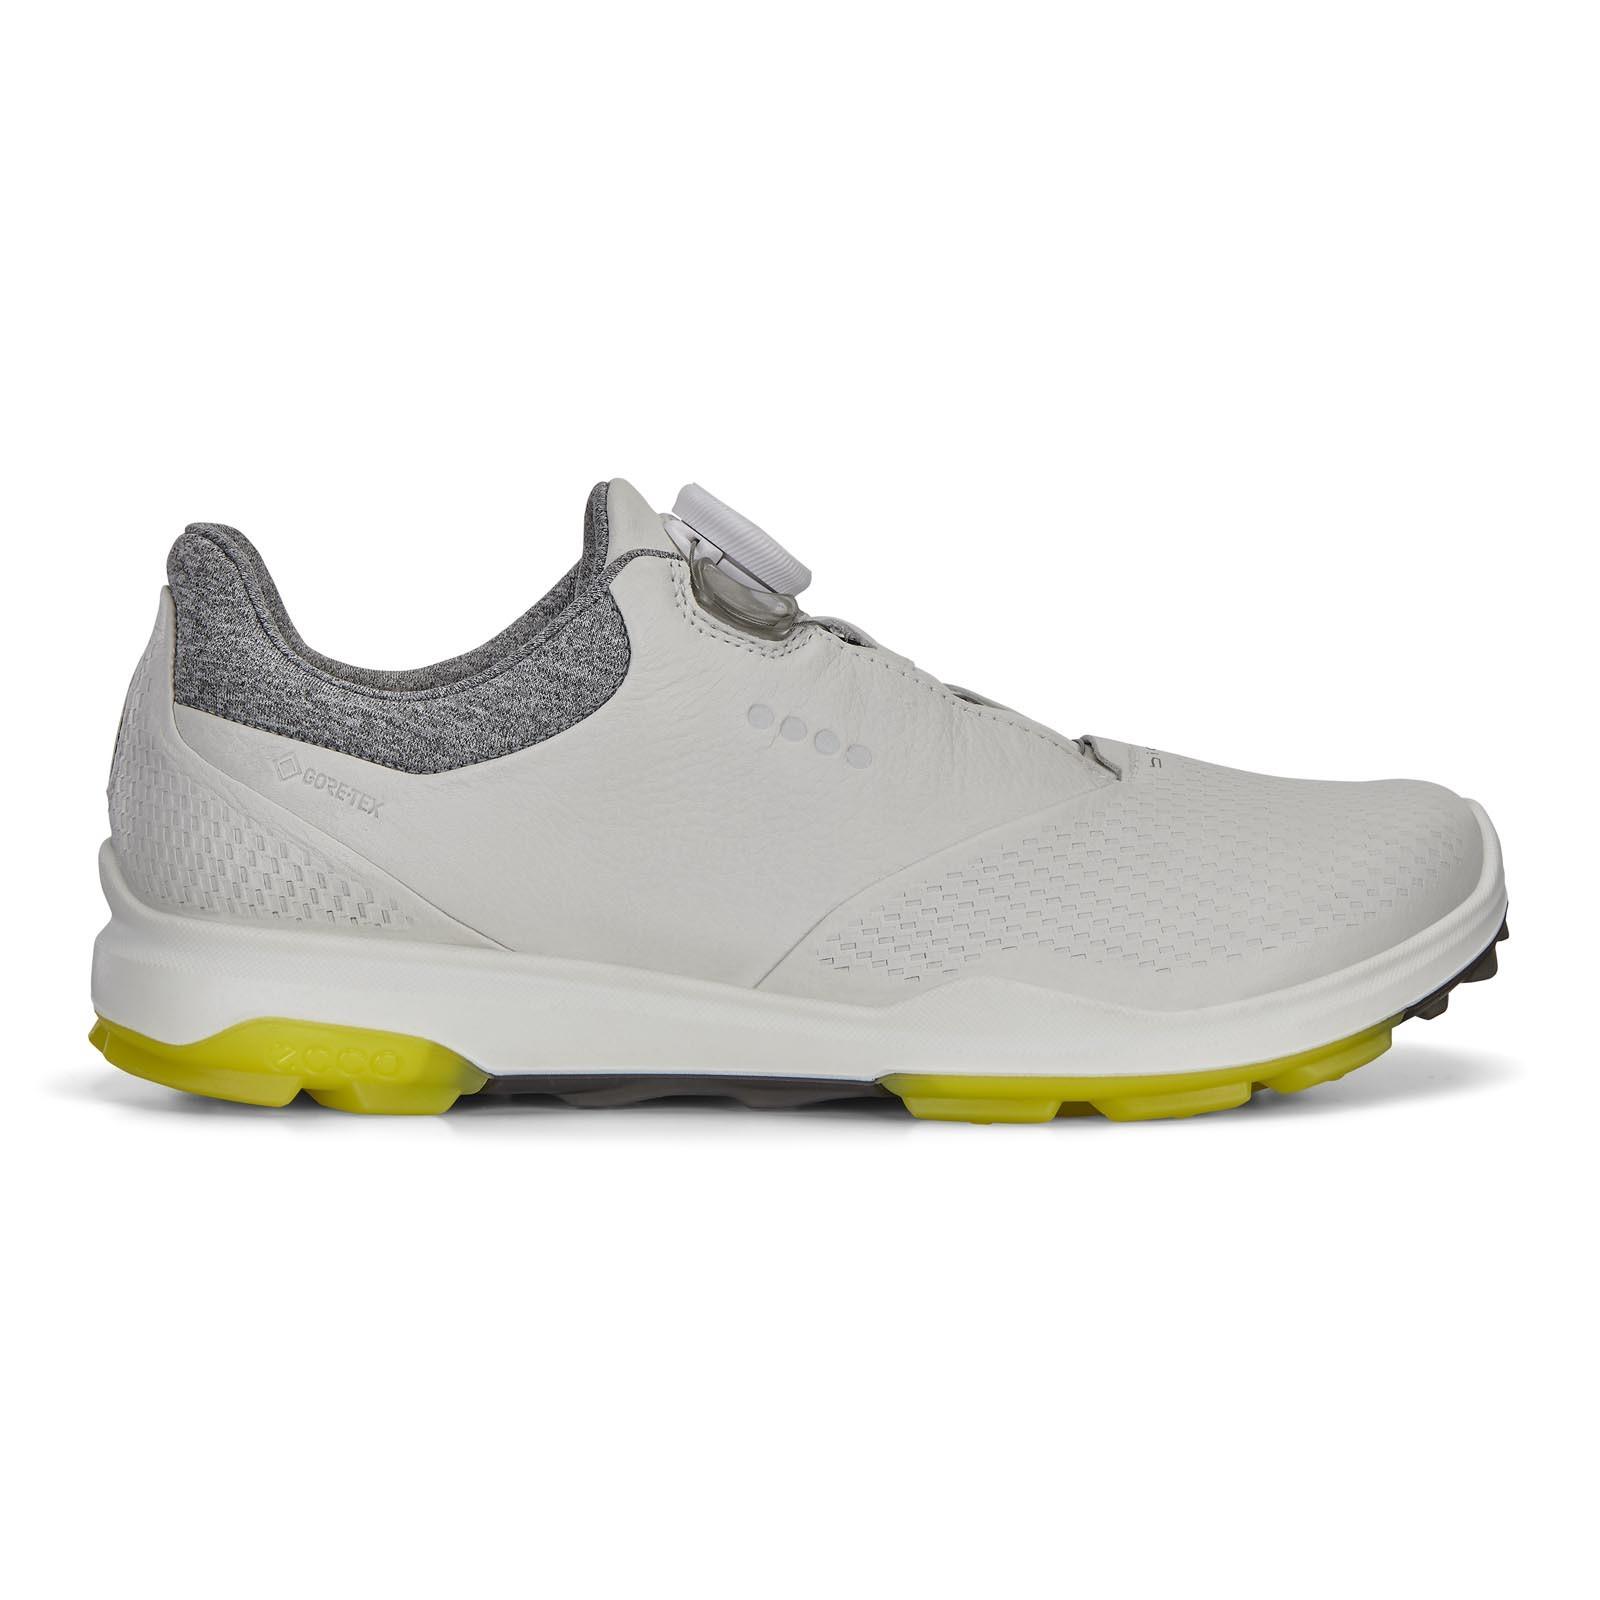 Ecco Biom Hybrid 3 BOA Womens Golf Shoes